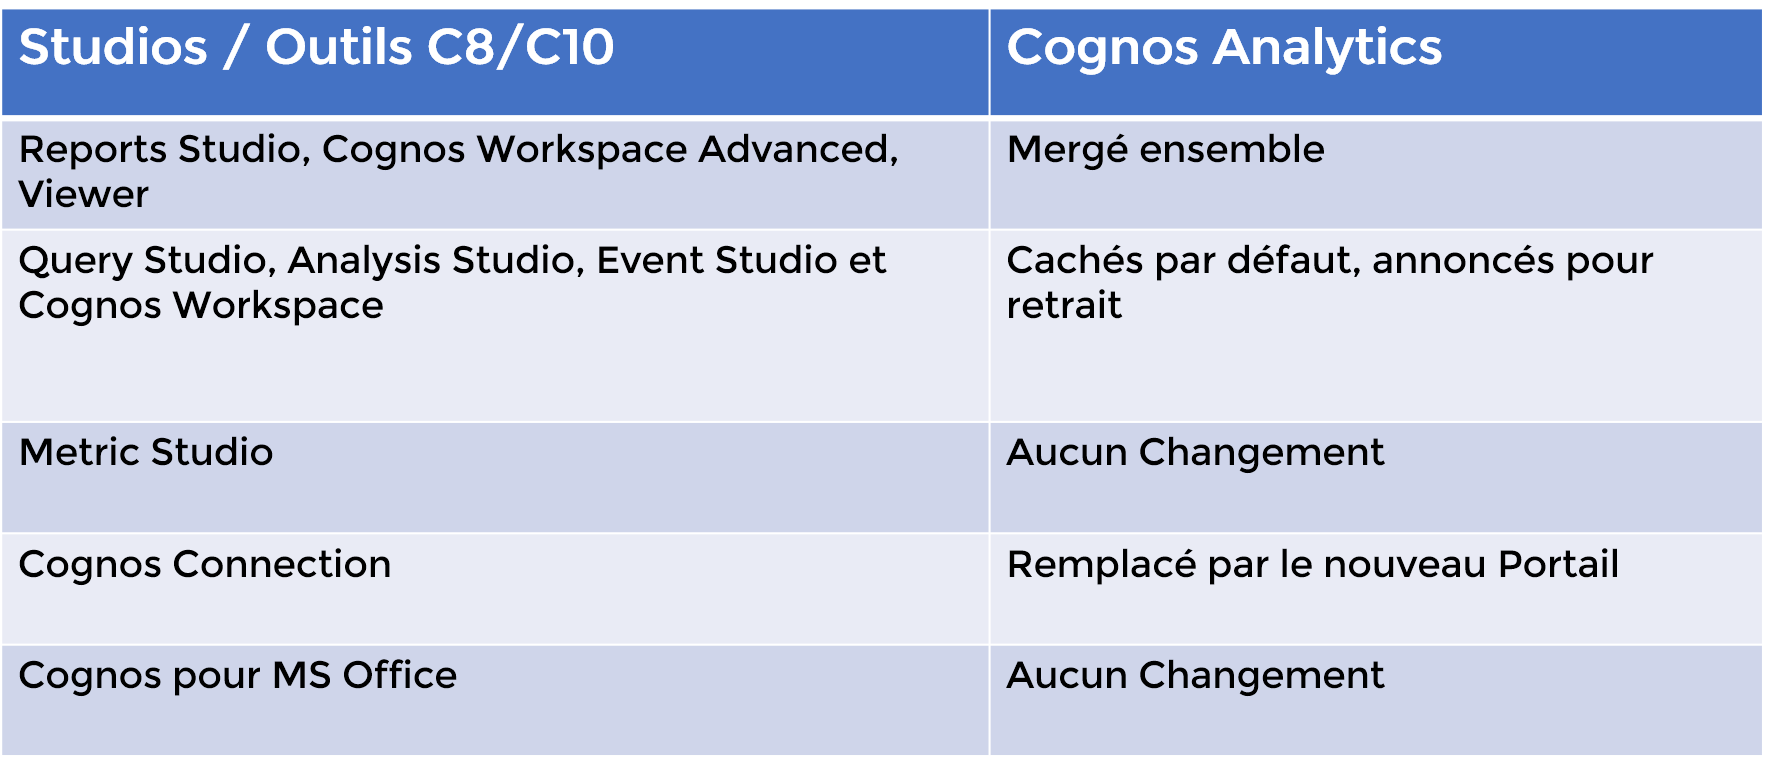 studios equivalent